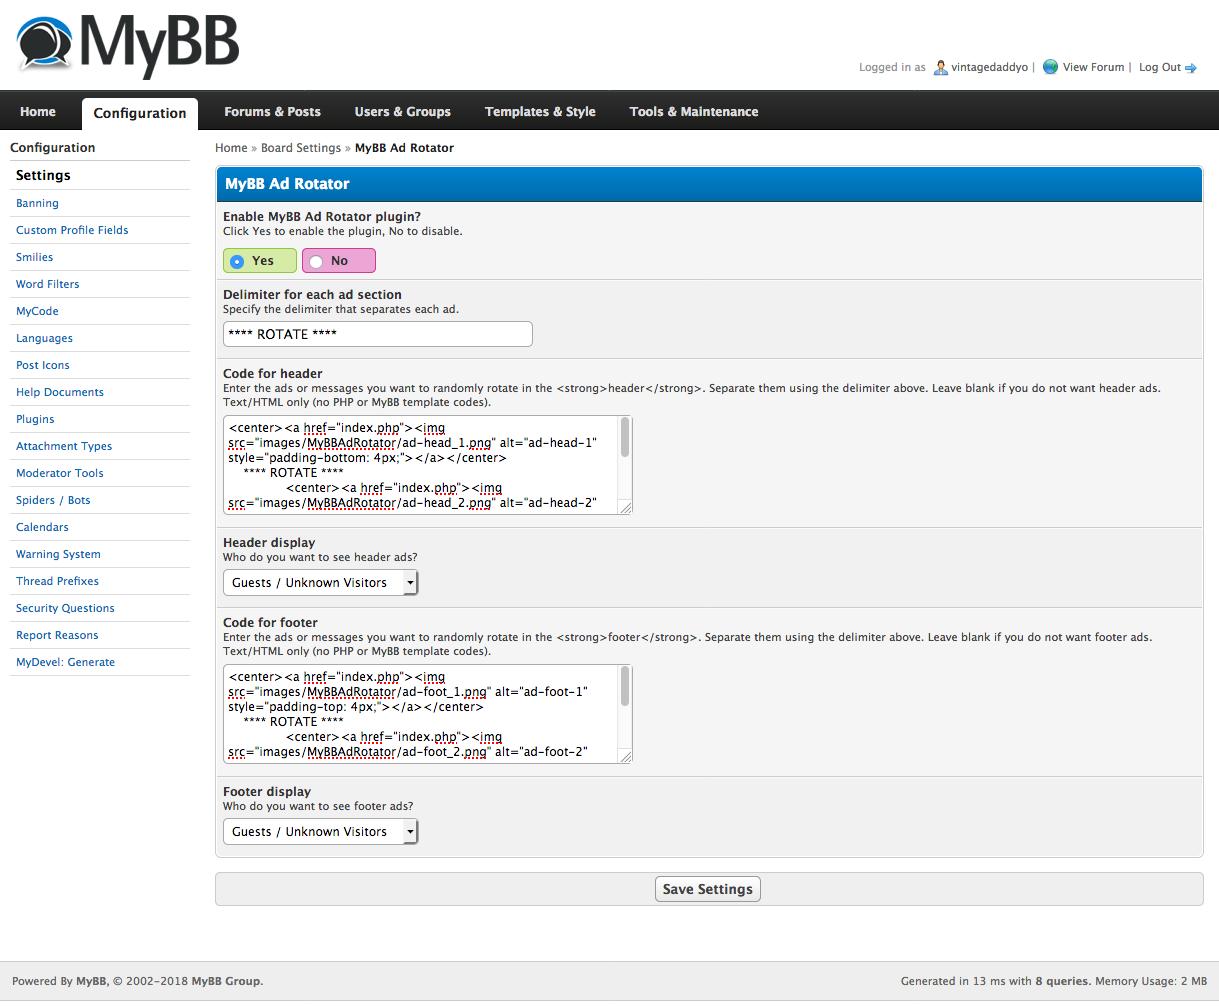 Extend MyBB - MyBB Ad Rotator